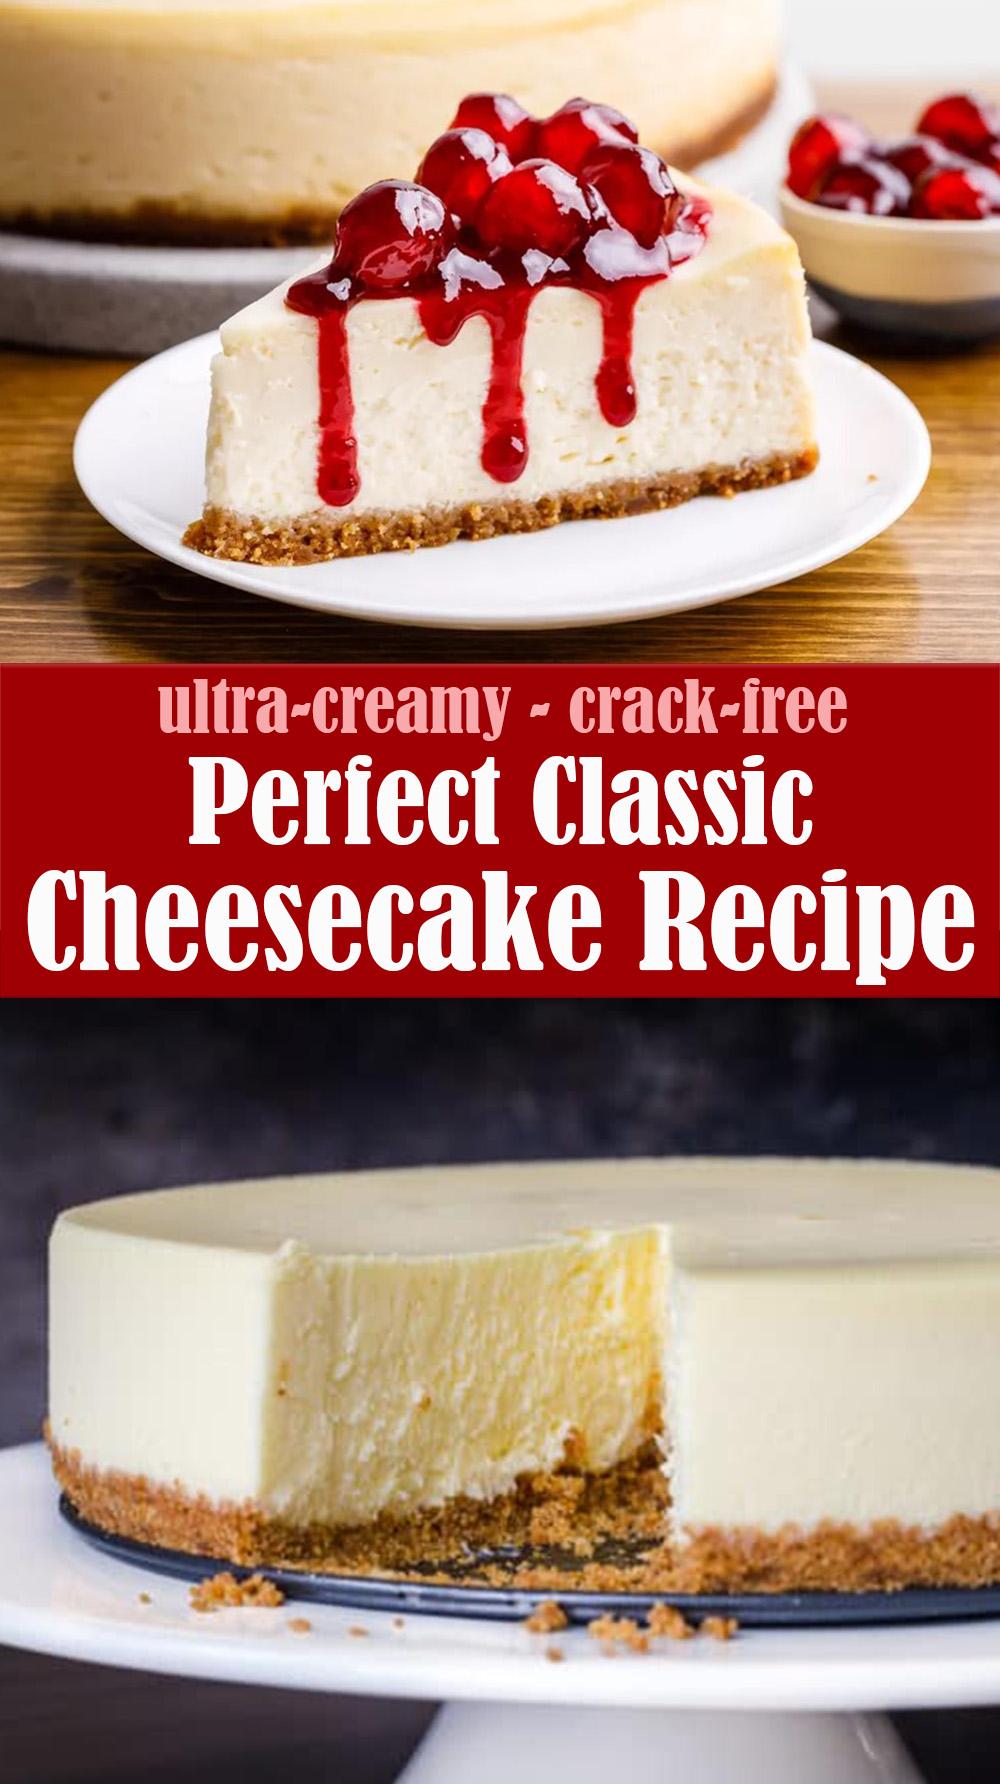 Perfect Classic Cheesecake Recipe